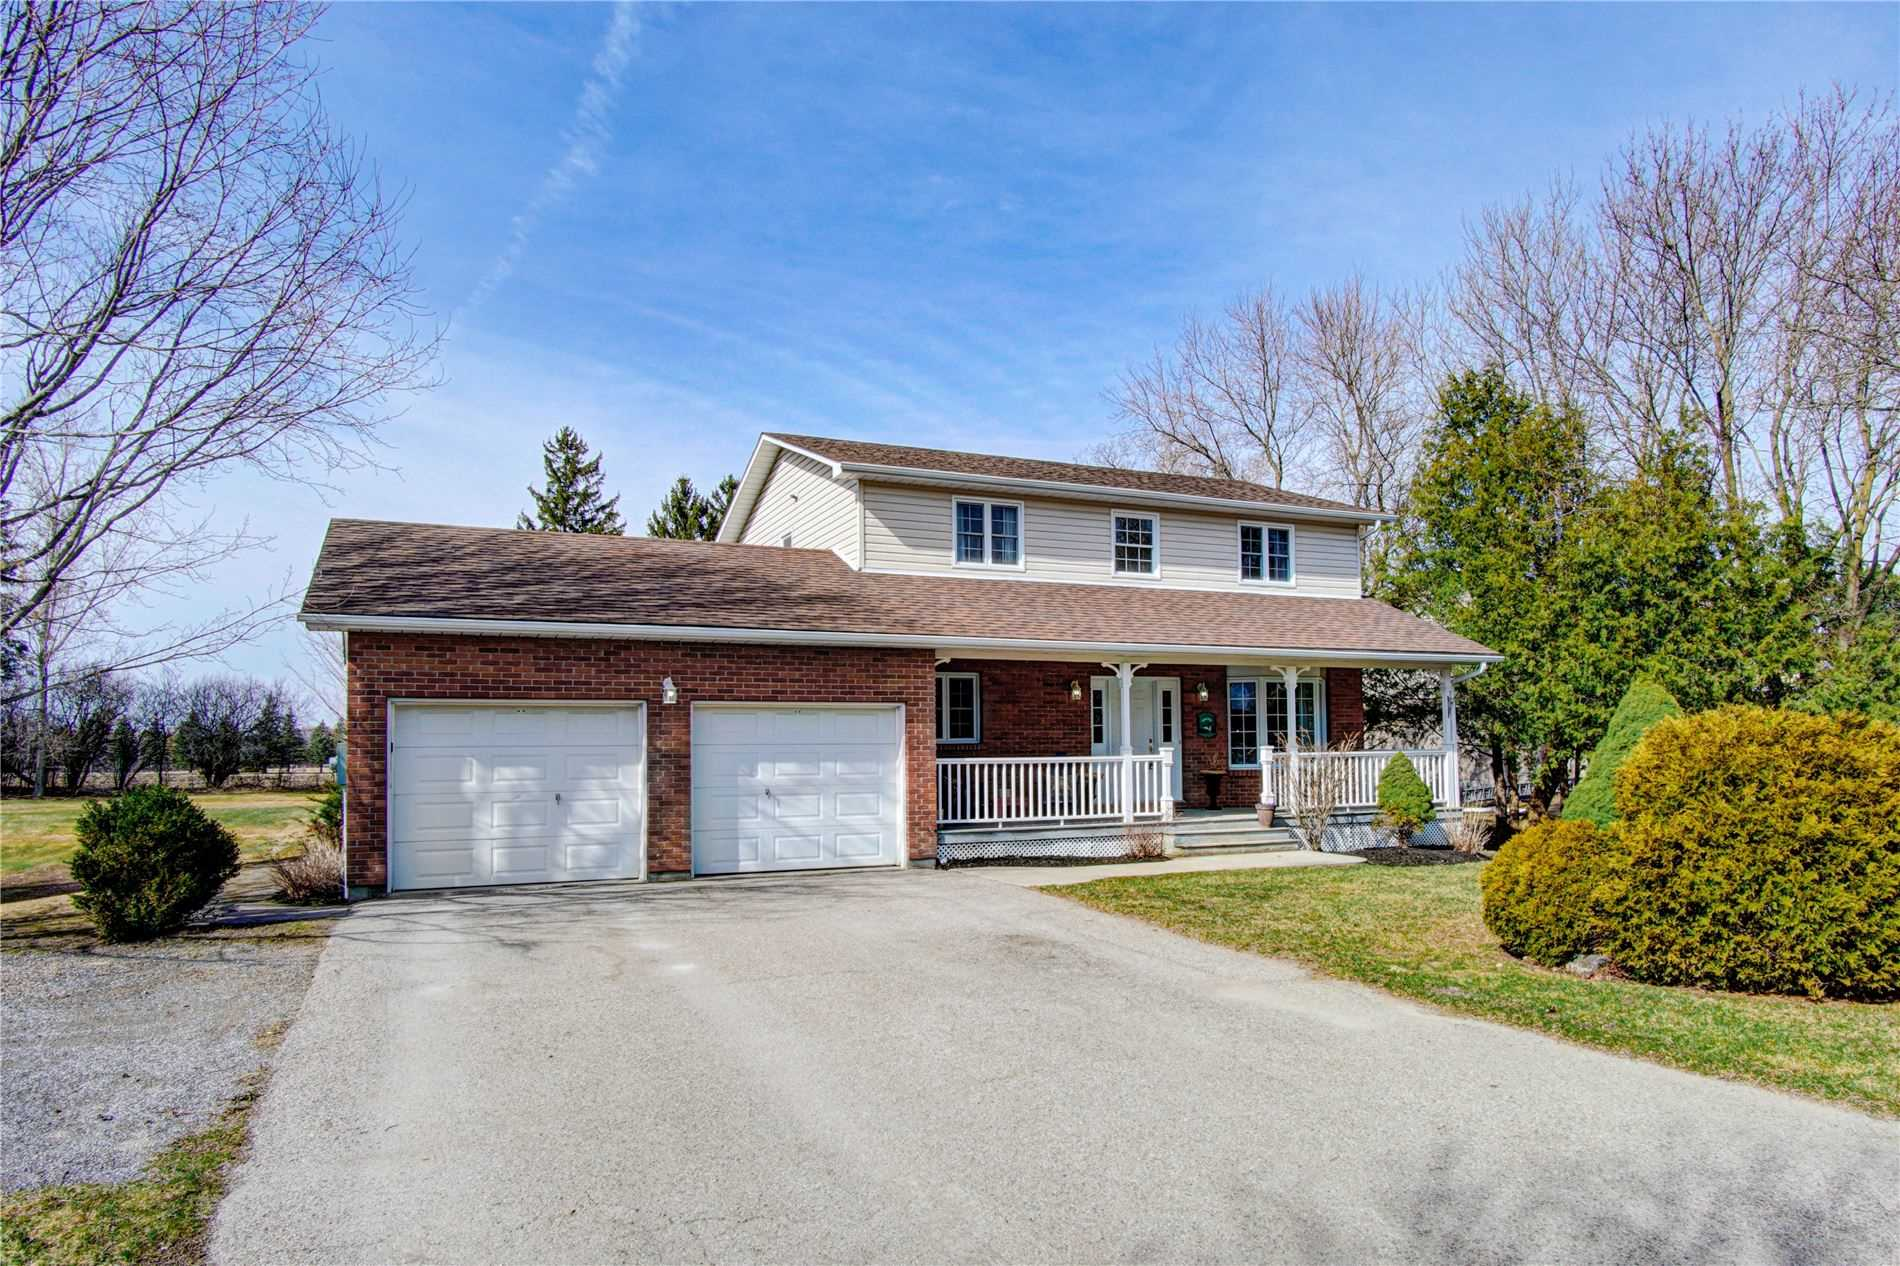 7A Colby Rd, Uxbridge, Ontario L9P1R7, 4 Bedrooms Bedrooms, ,3 BathroomsBathrooms,Detached,For Sale,Colby,N5169675